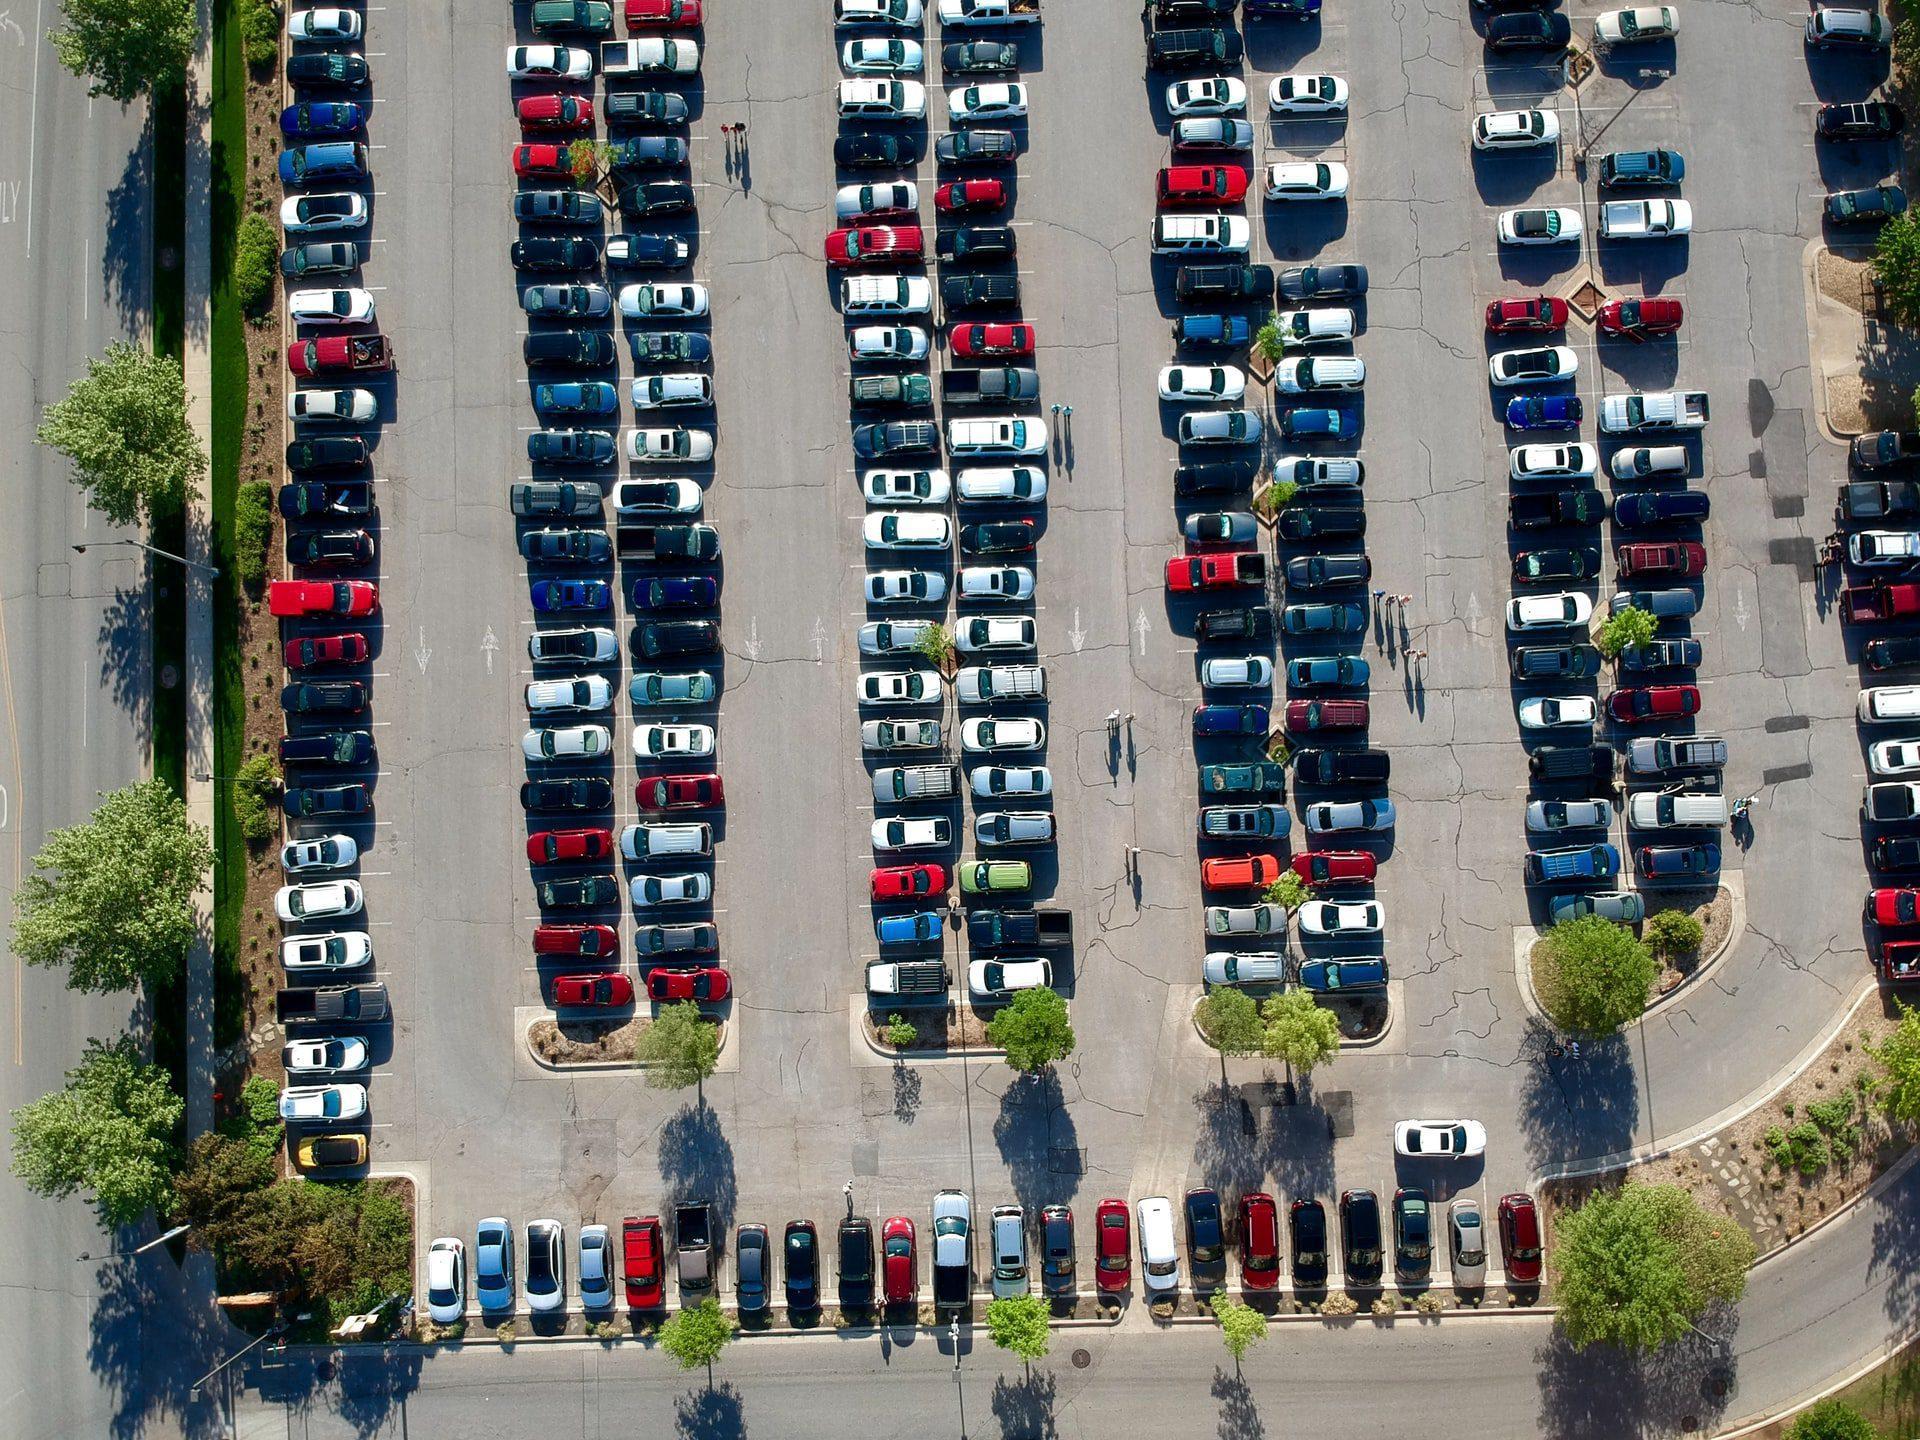 advogado estacionamento